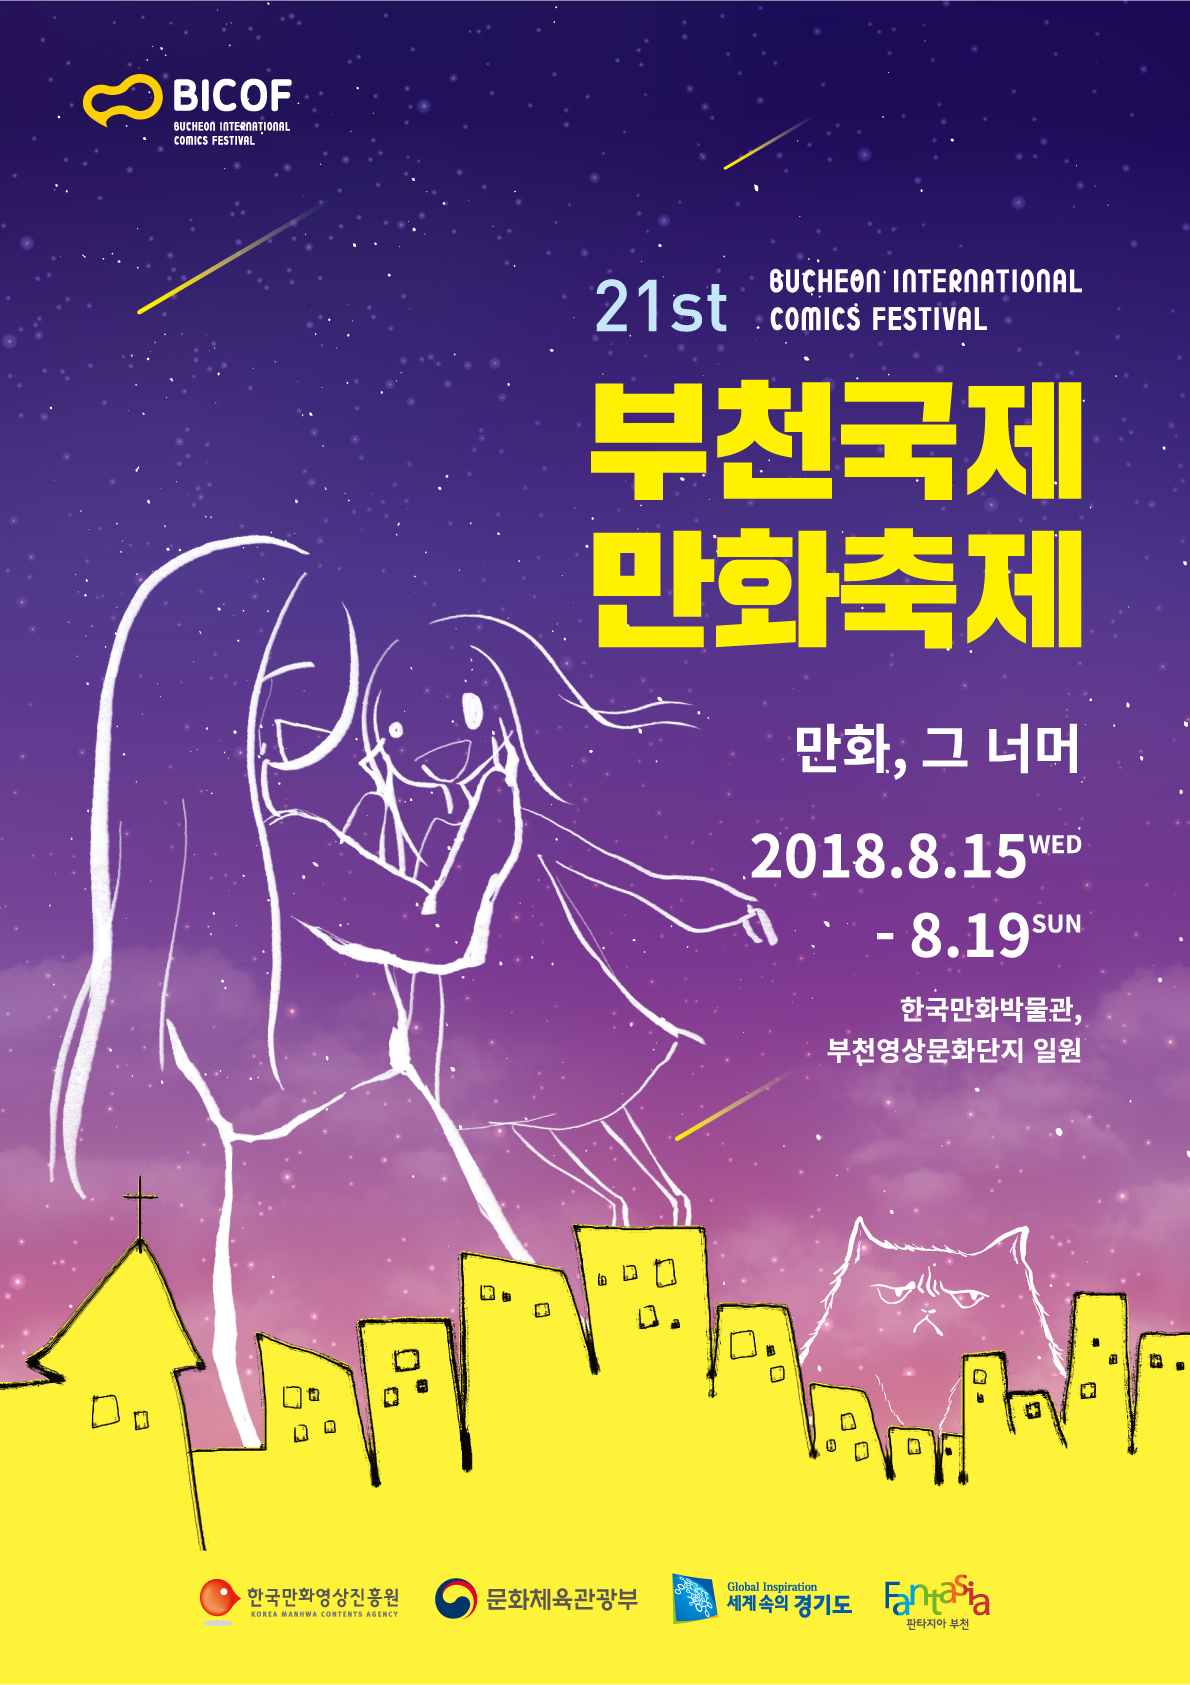 BICOF, 21st Bucheon International Comics Festival, 부천국제만화축제, 만화,그 너머, 2018.8.15 Wed ~ 8.19 Sun, 한국만화박물관, 부천영상문화단지 일원